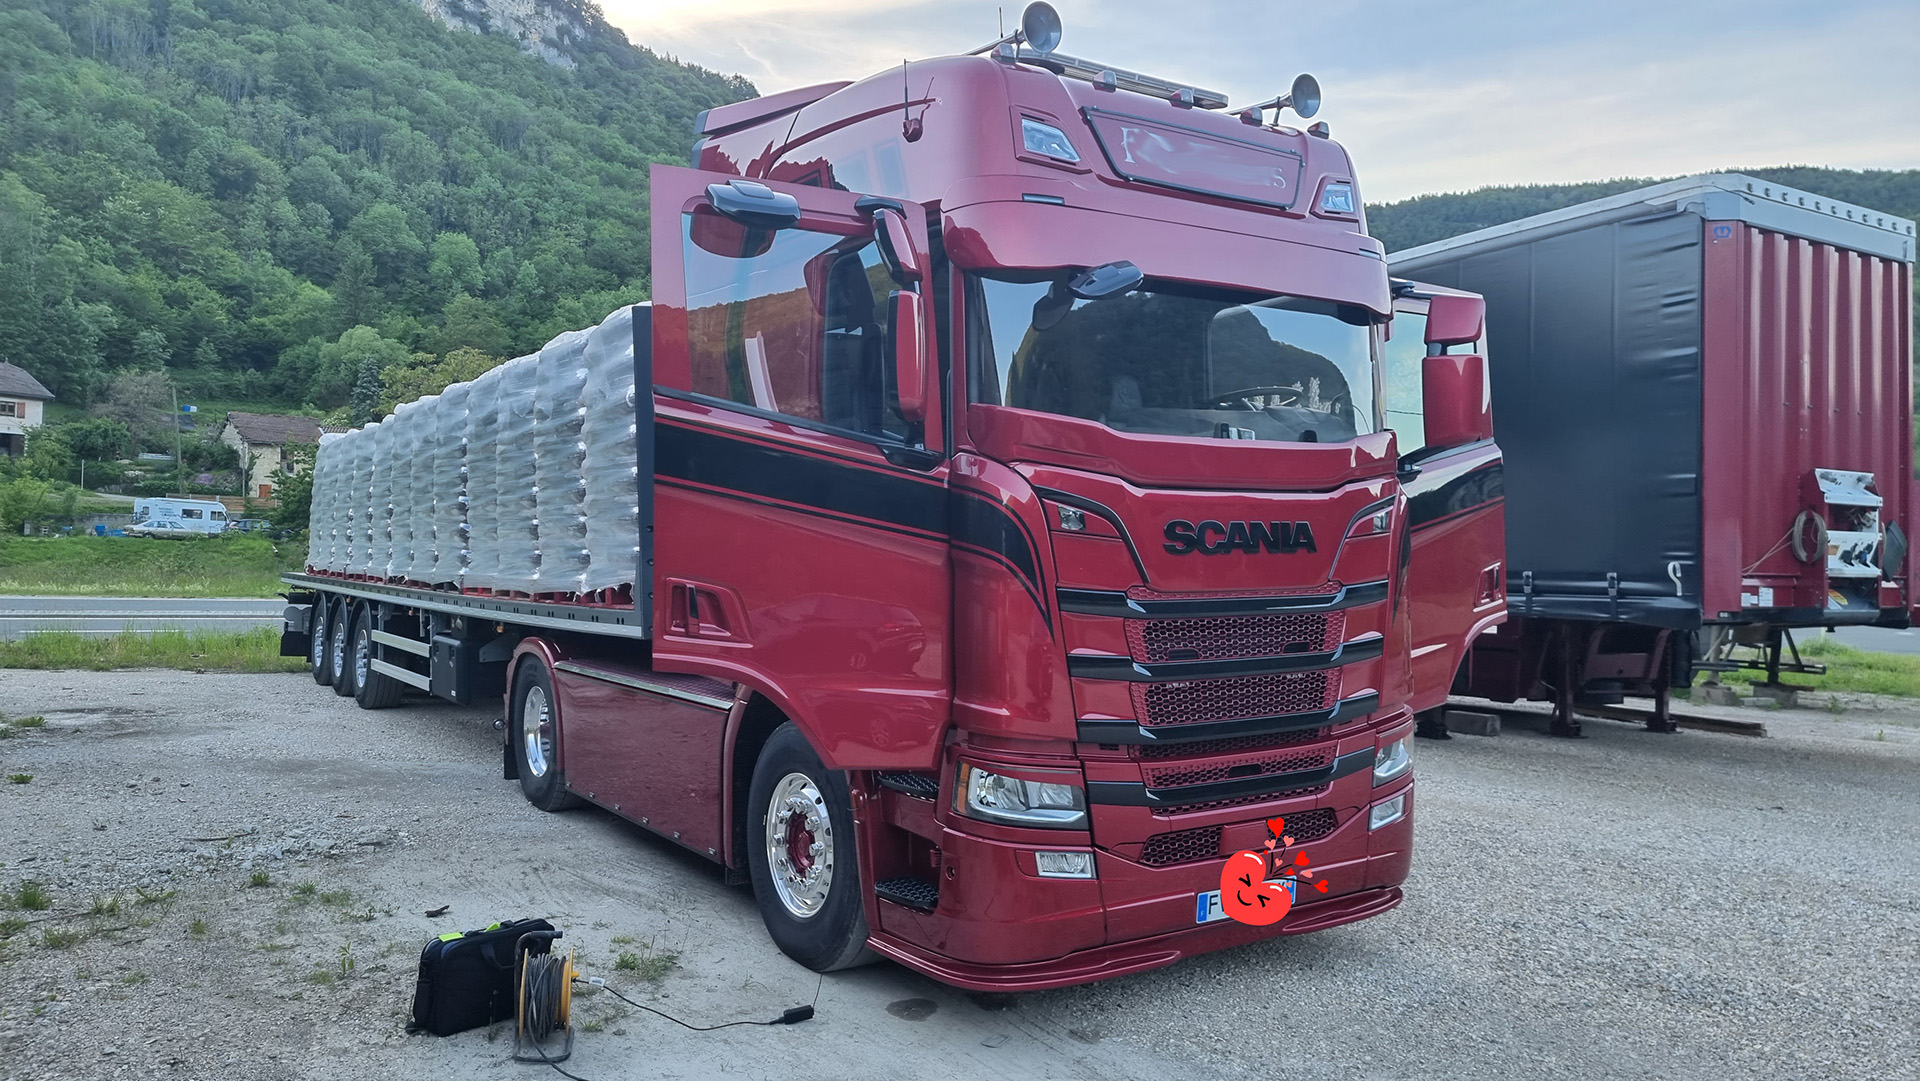 AdBlue FAP Scania R650 S650 V8 Euro 6 Echappement libre 2021